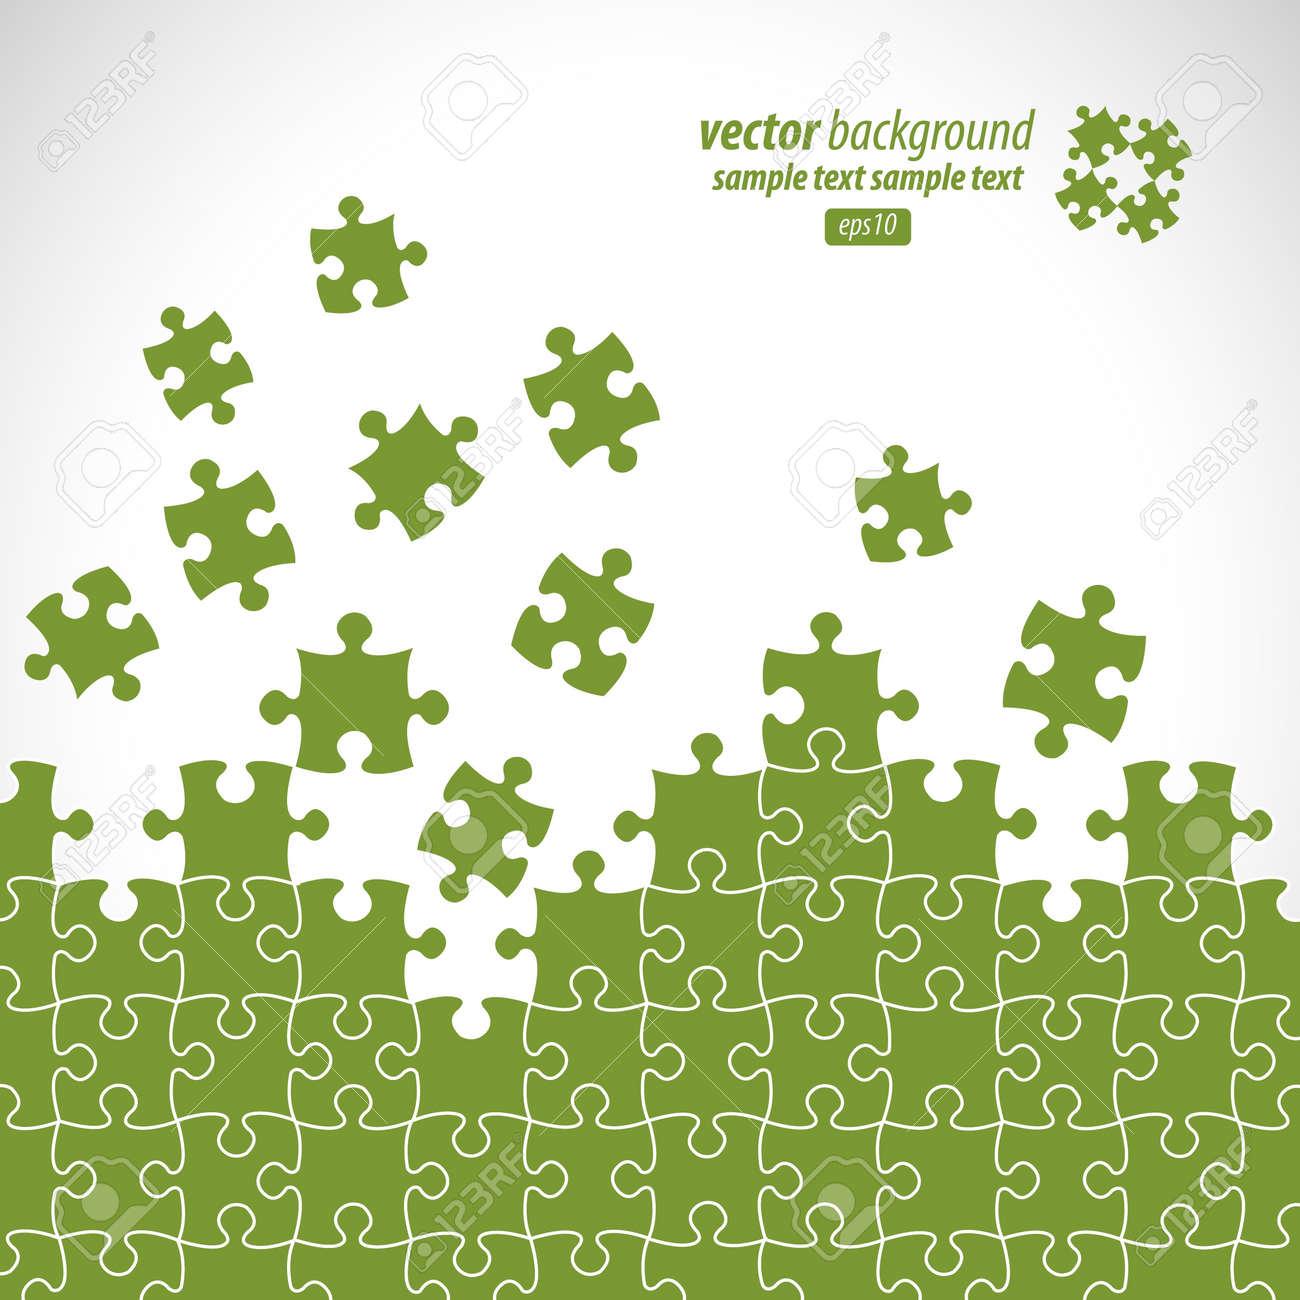 puzzle pieces vector design royalty free cliparts vectors and